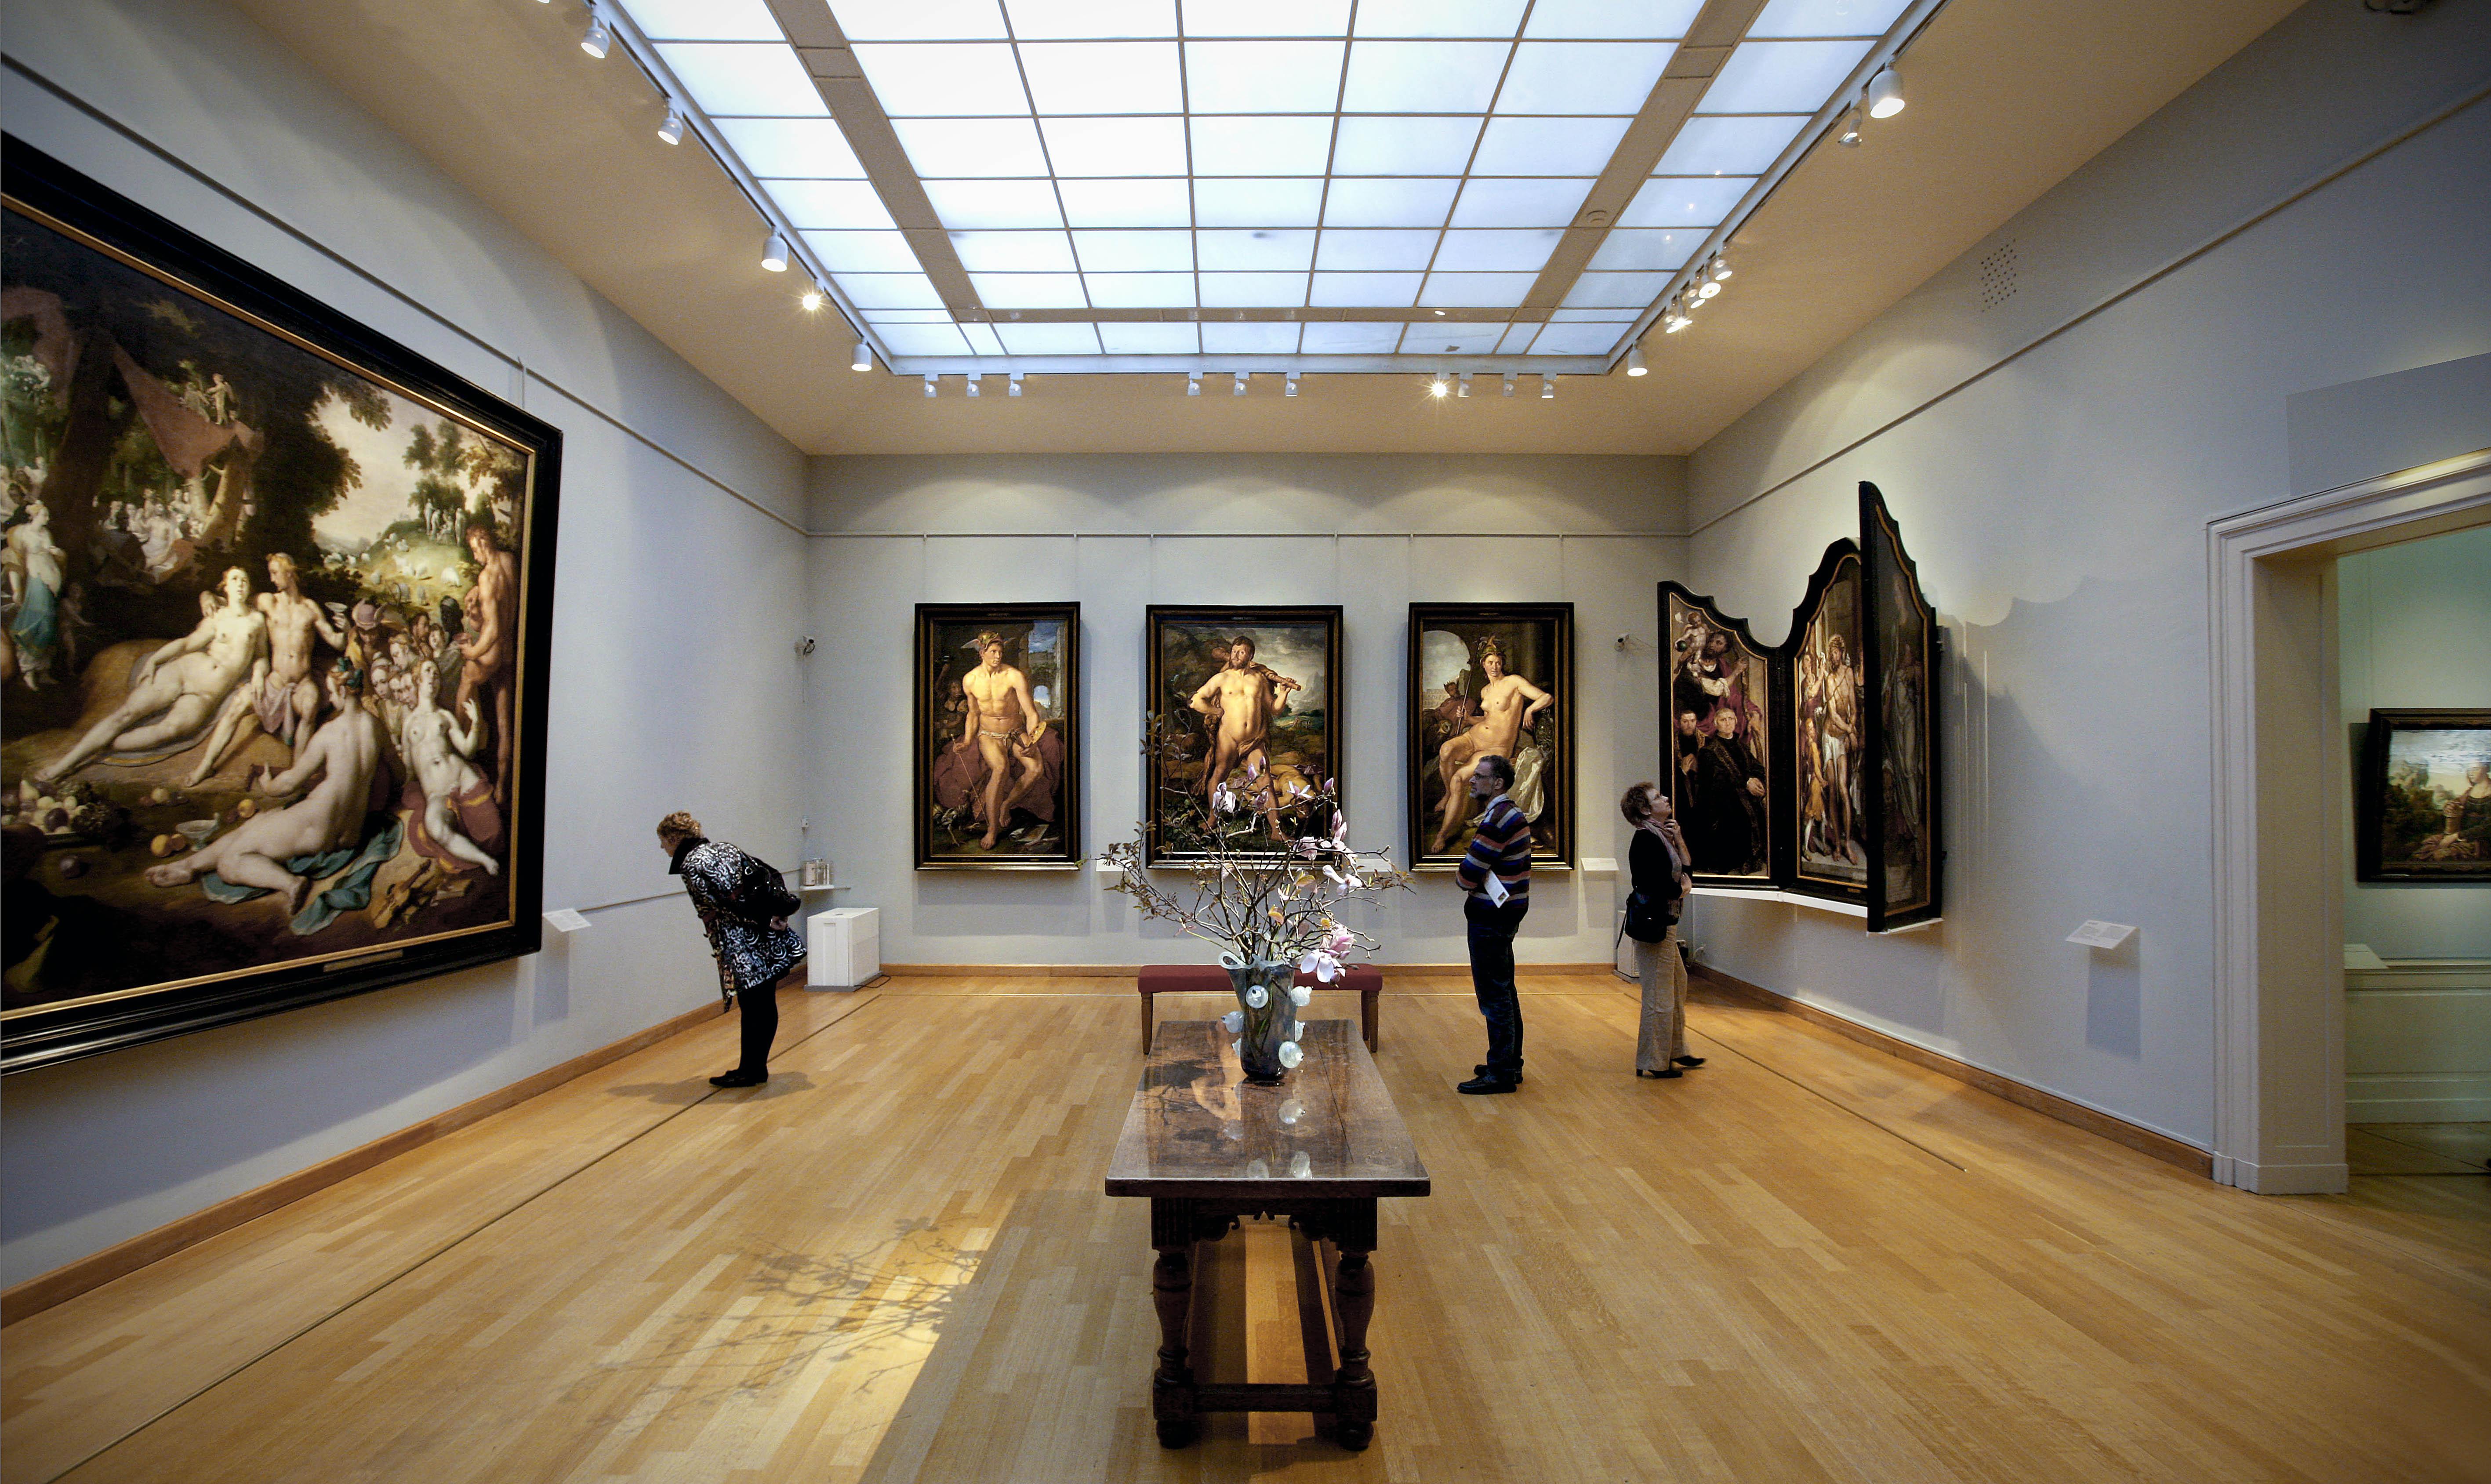 Frans Hals Museum in Haarlem